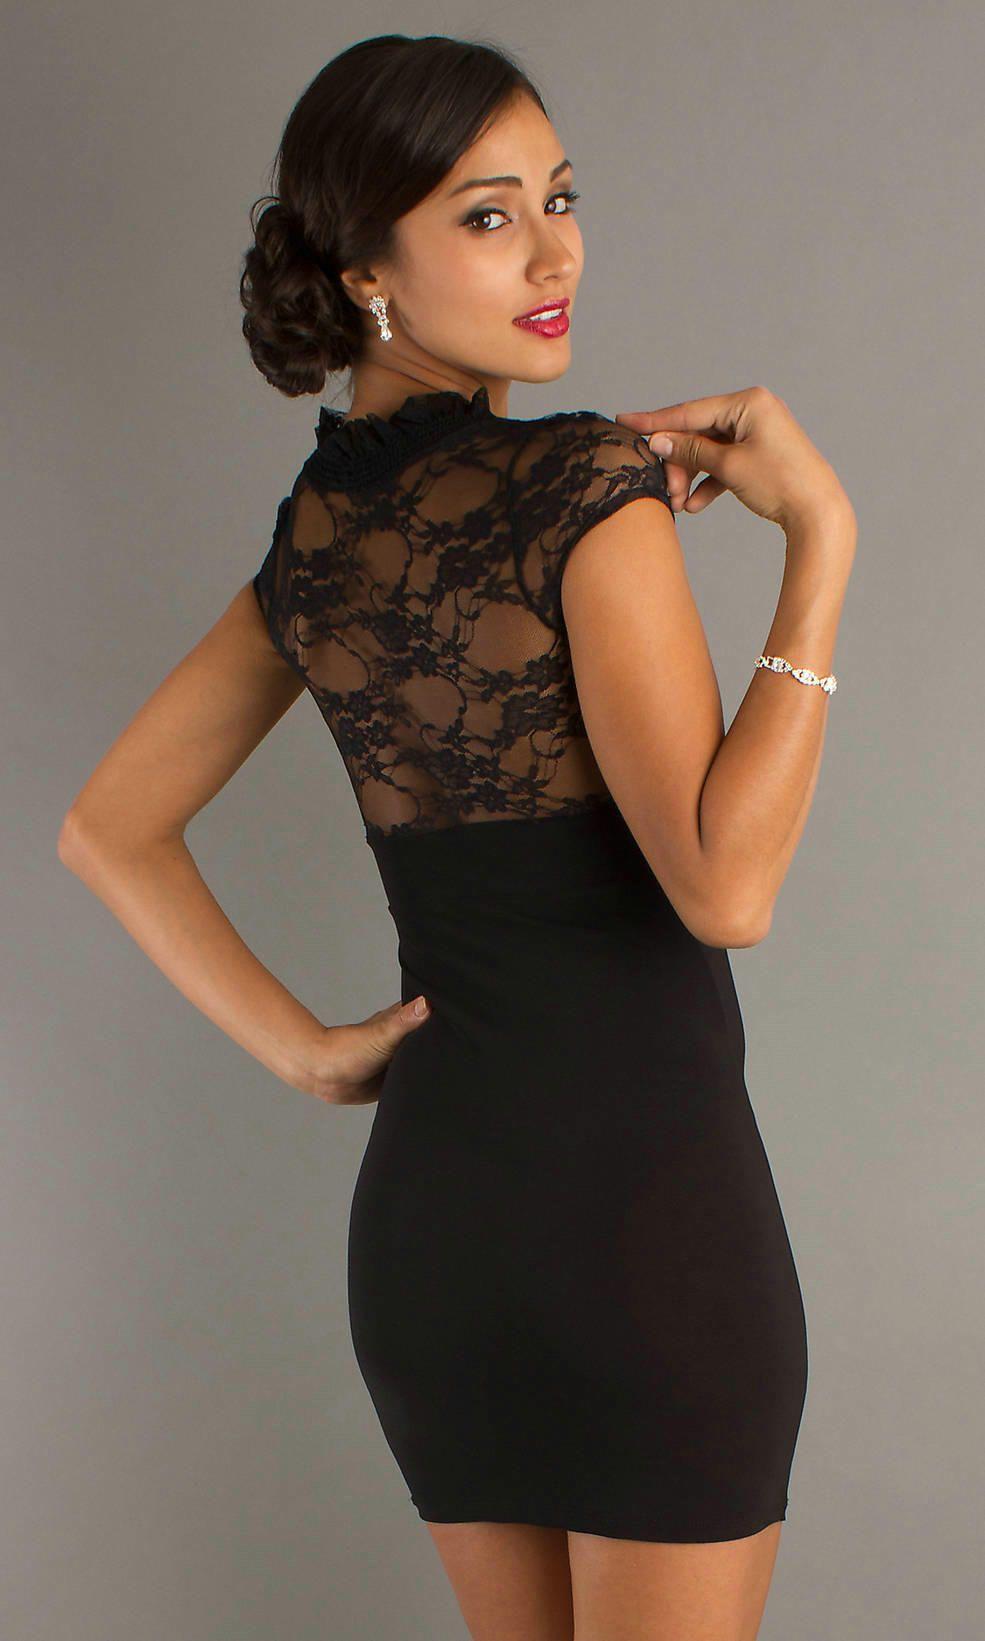 12b0b9b435c8 Beauties Wearing The Little Black Dress | Fashion | Semi formal ...